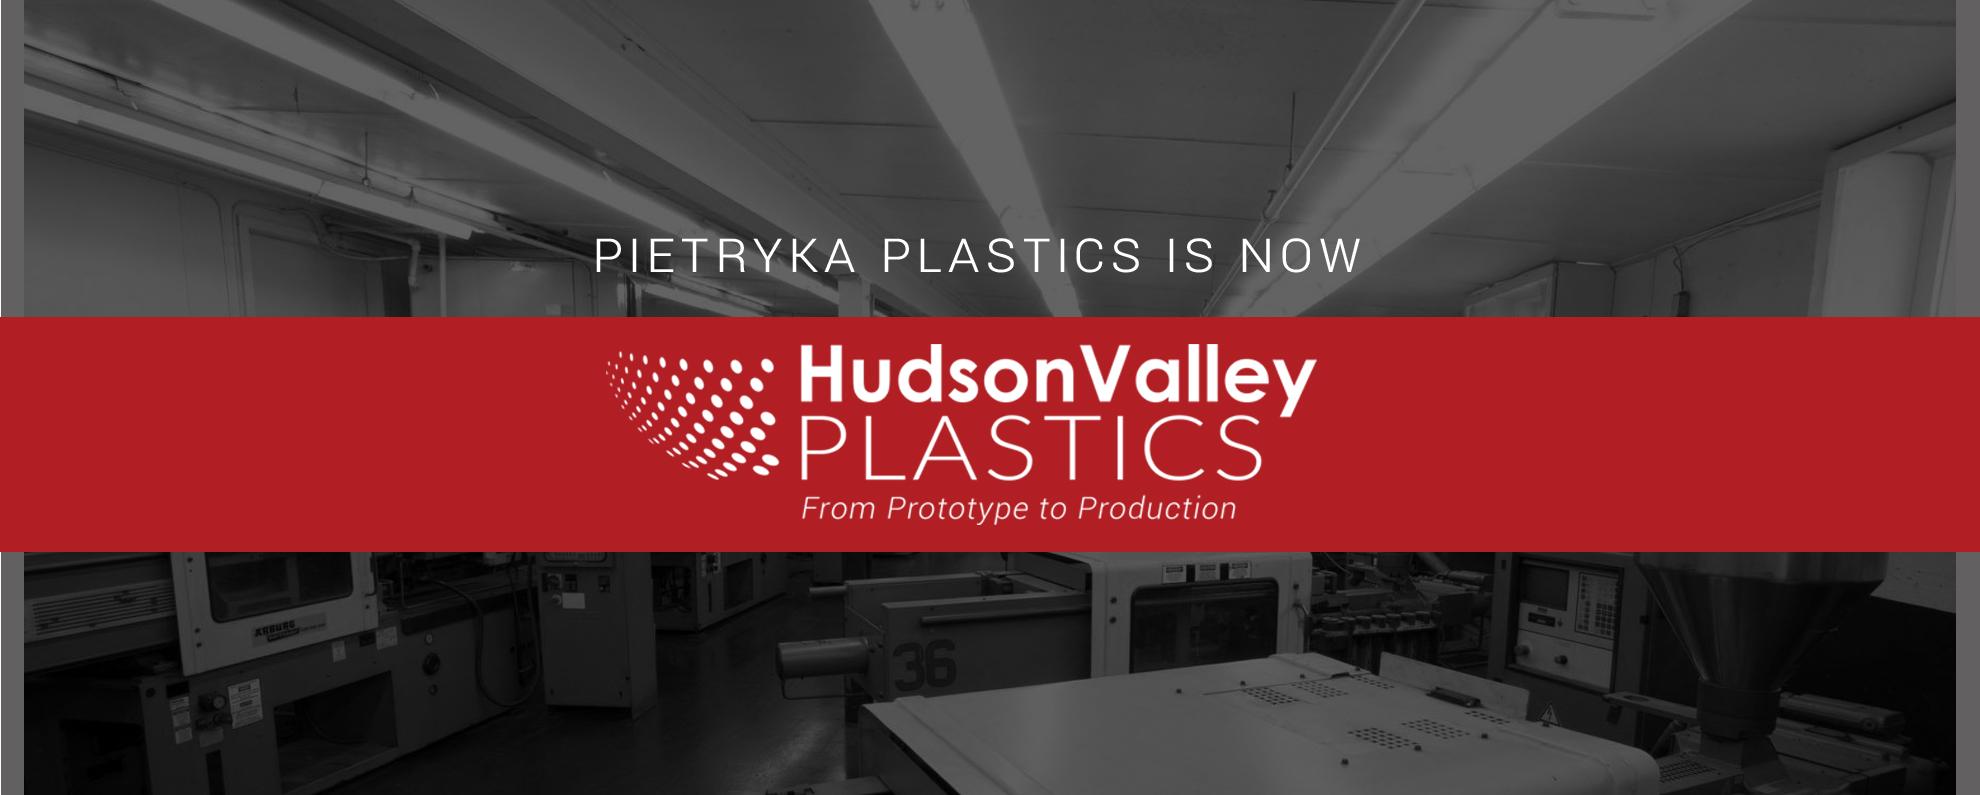 Hudson Valley Plastics